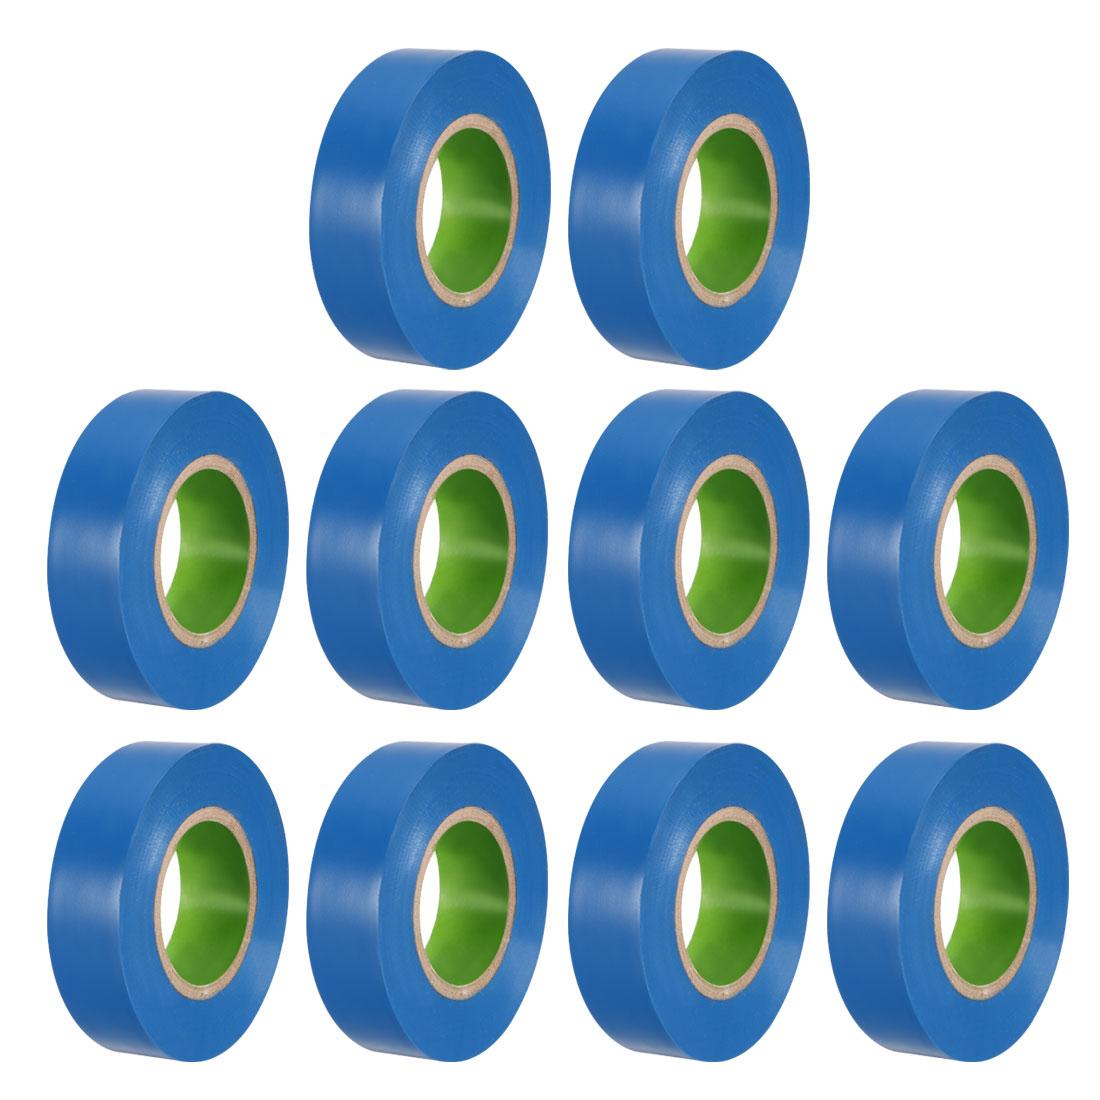 Uxcell شريط عازل 18 مللي متر/0.7 بوصة عرض 20M/65.6ft طويلة 0.1 مللي متر سميكة شريط PVC للأغراض الكهربية 10 قطعة